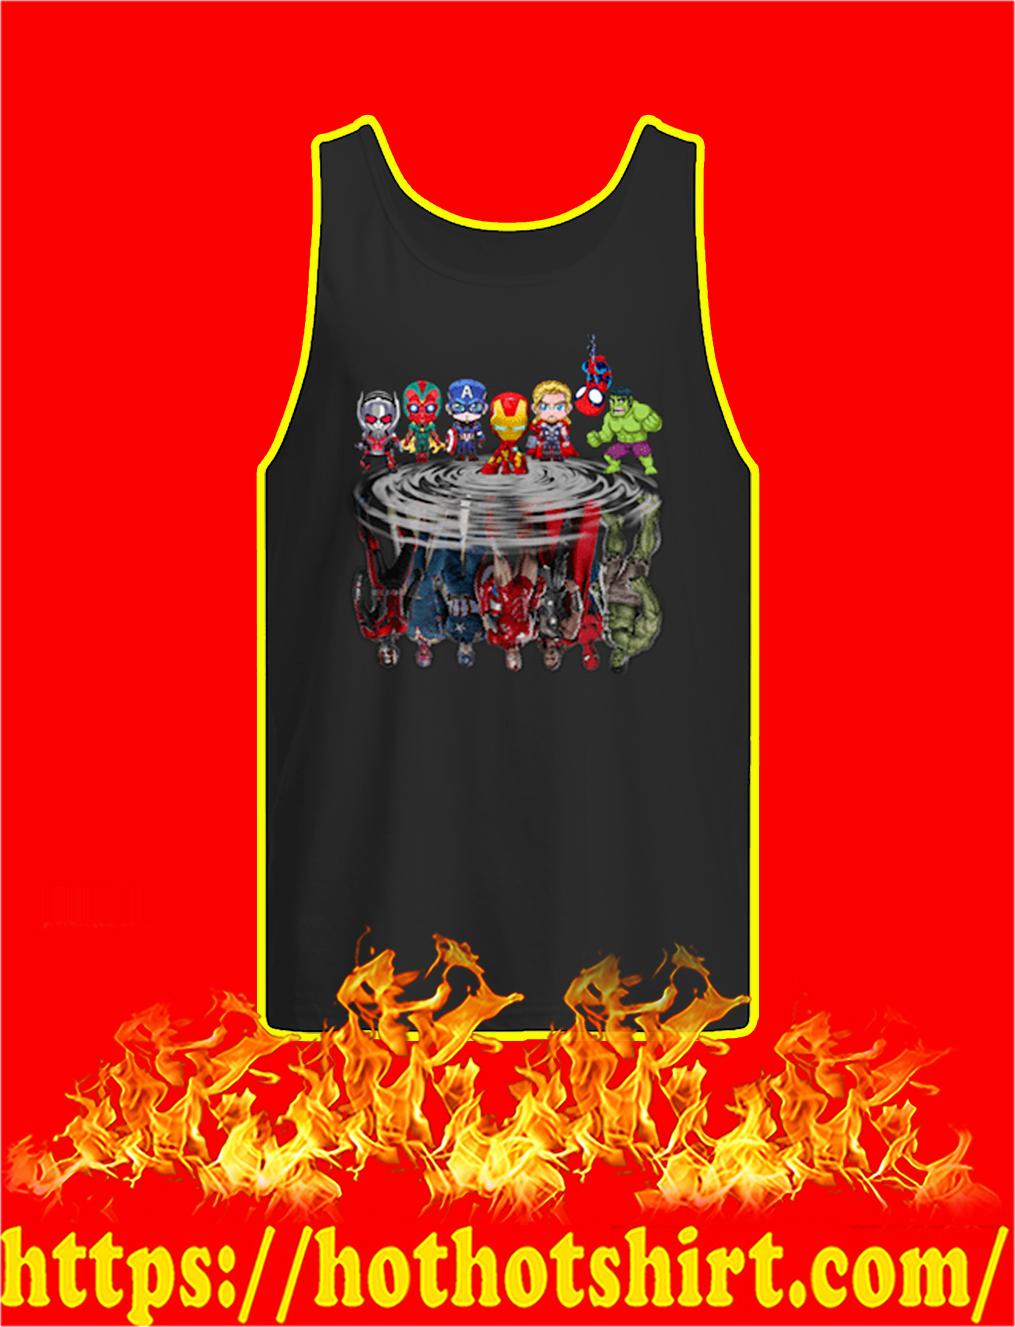 Chibi Avengers Reflection tank top